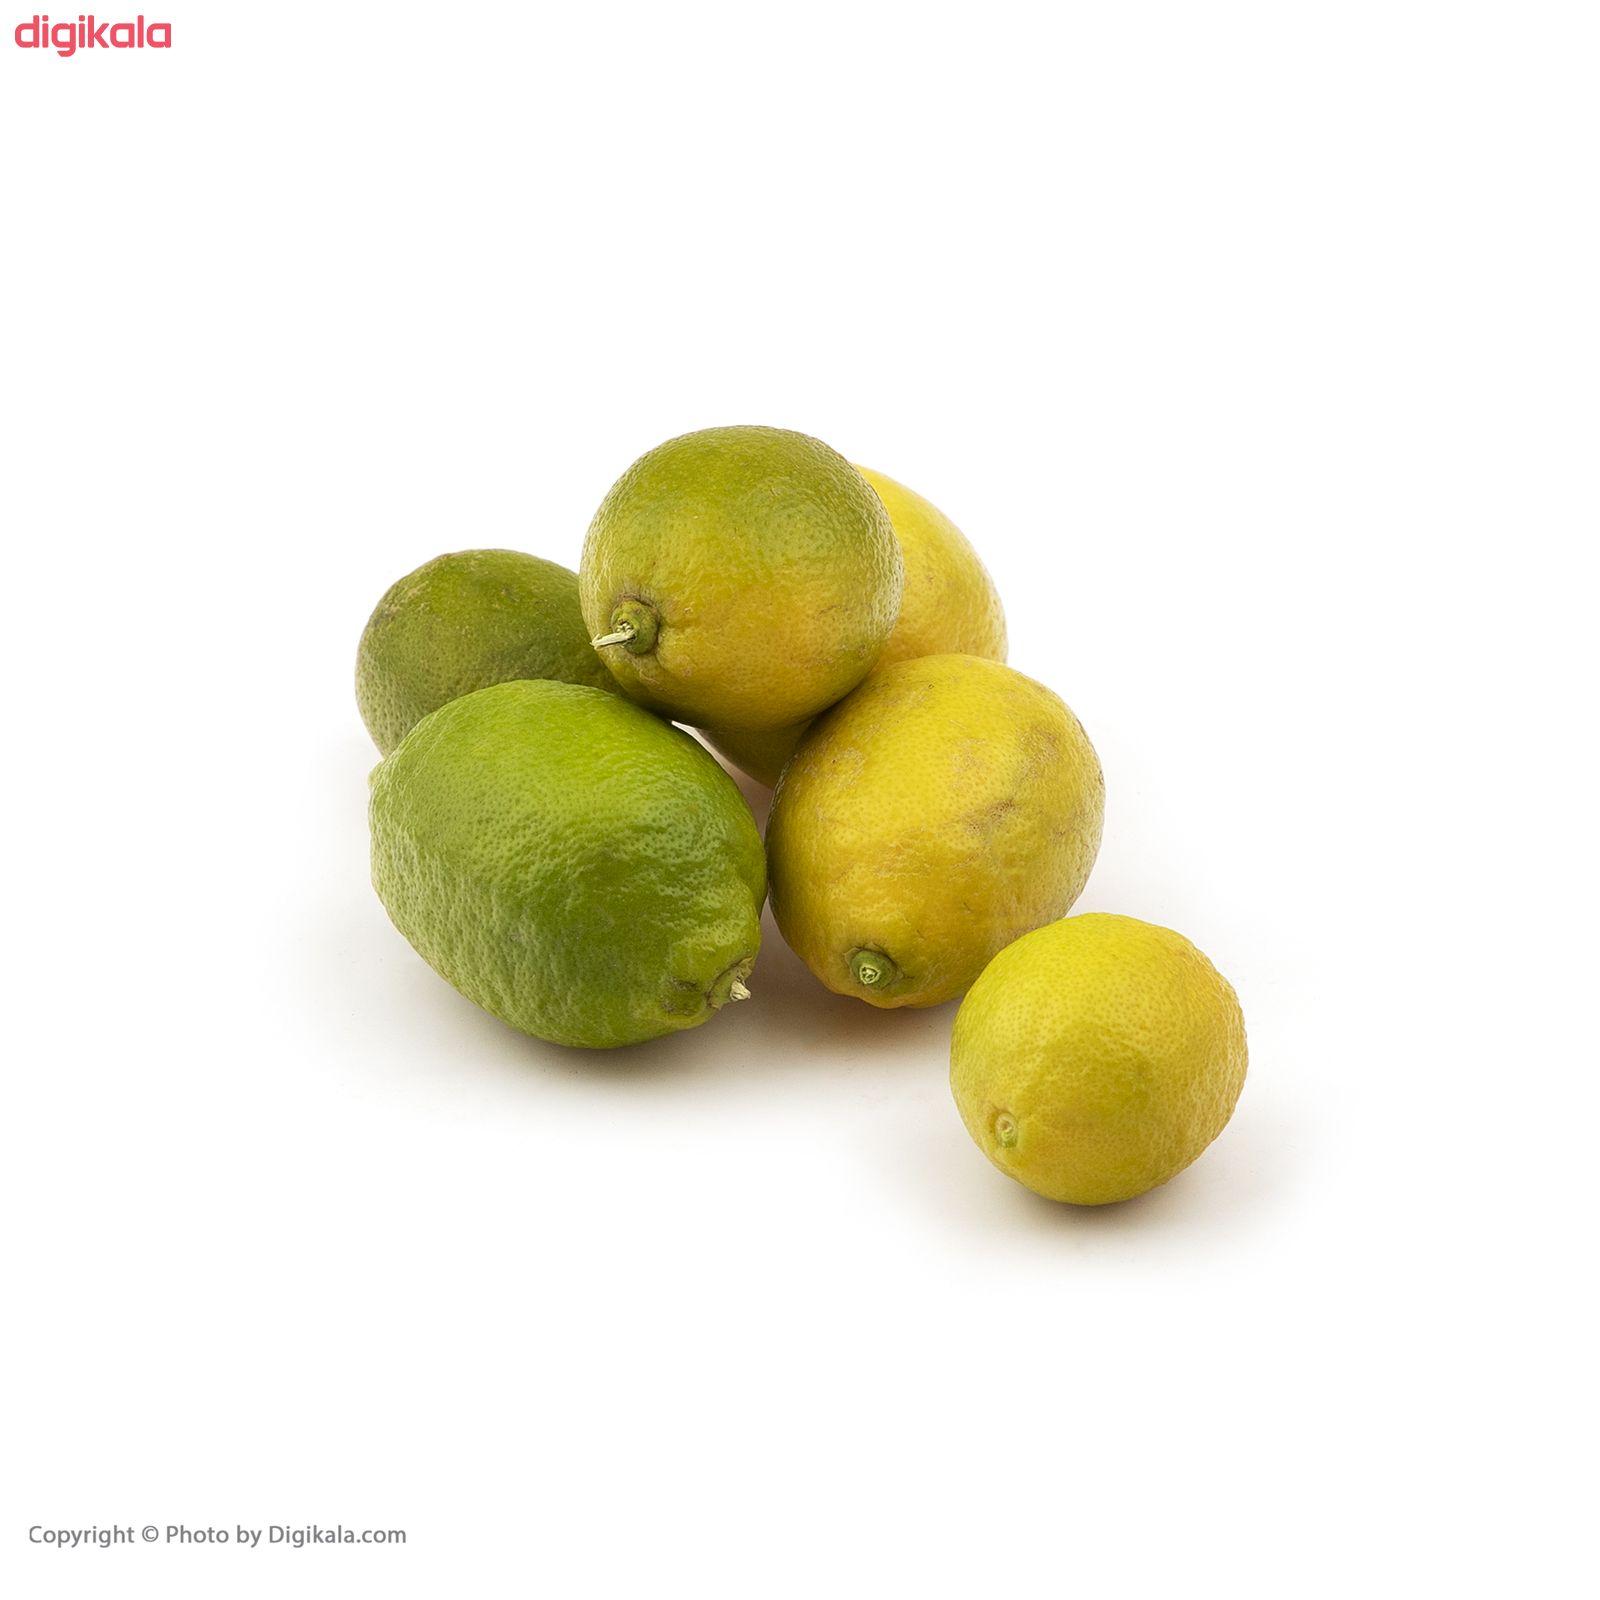 لیمو ترش سنگی فله - 500 گرم main 1 2